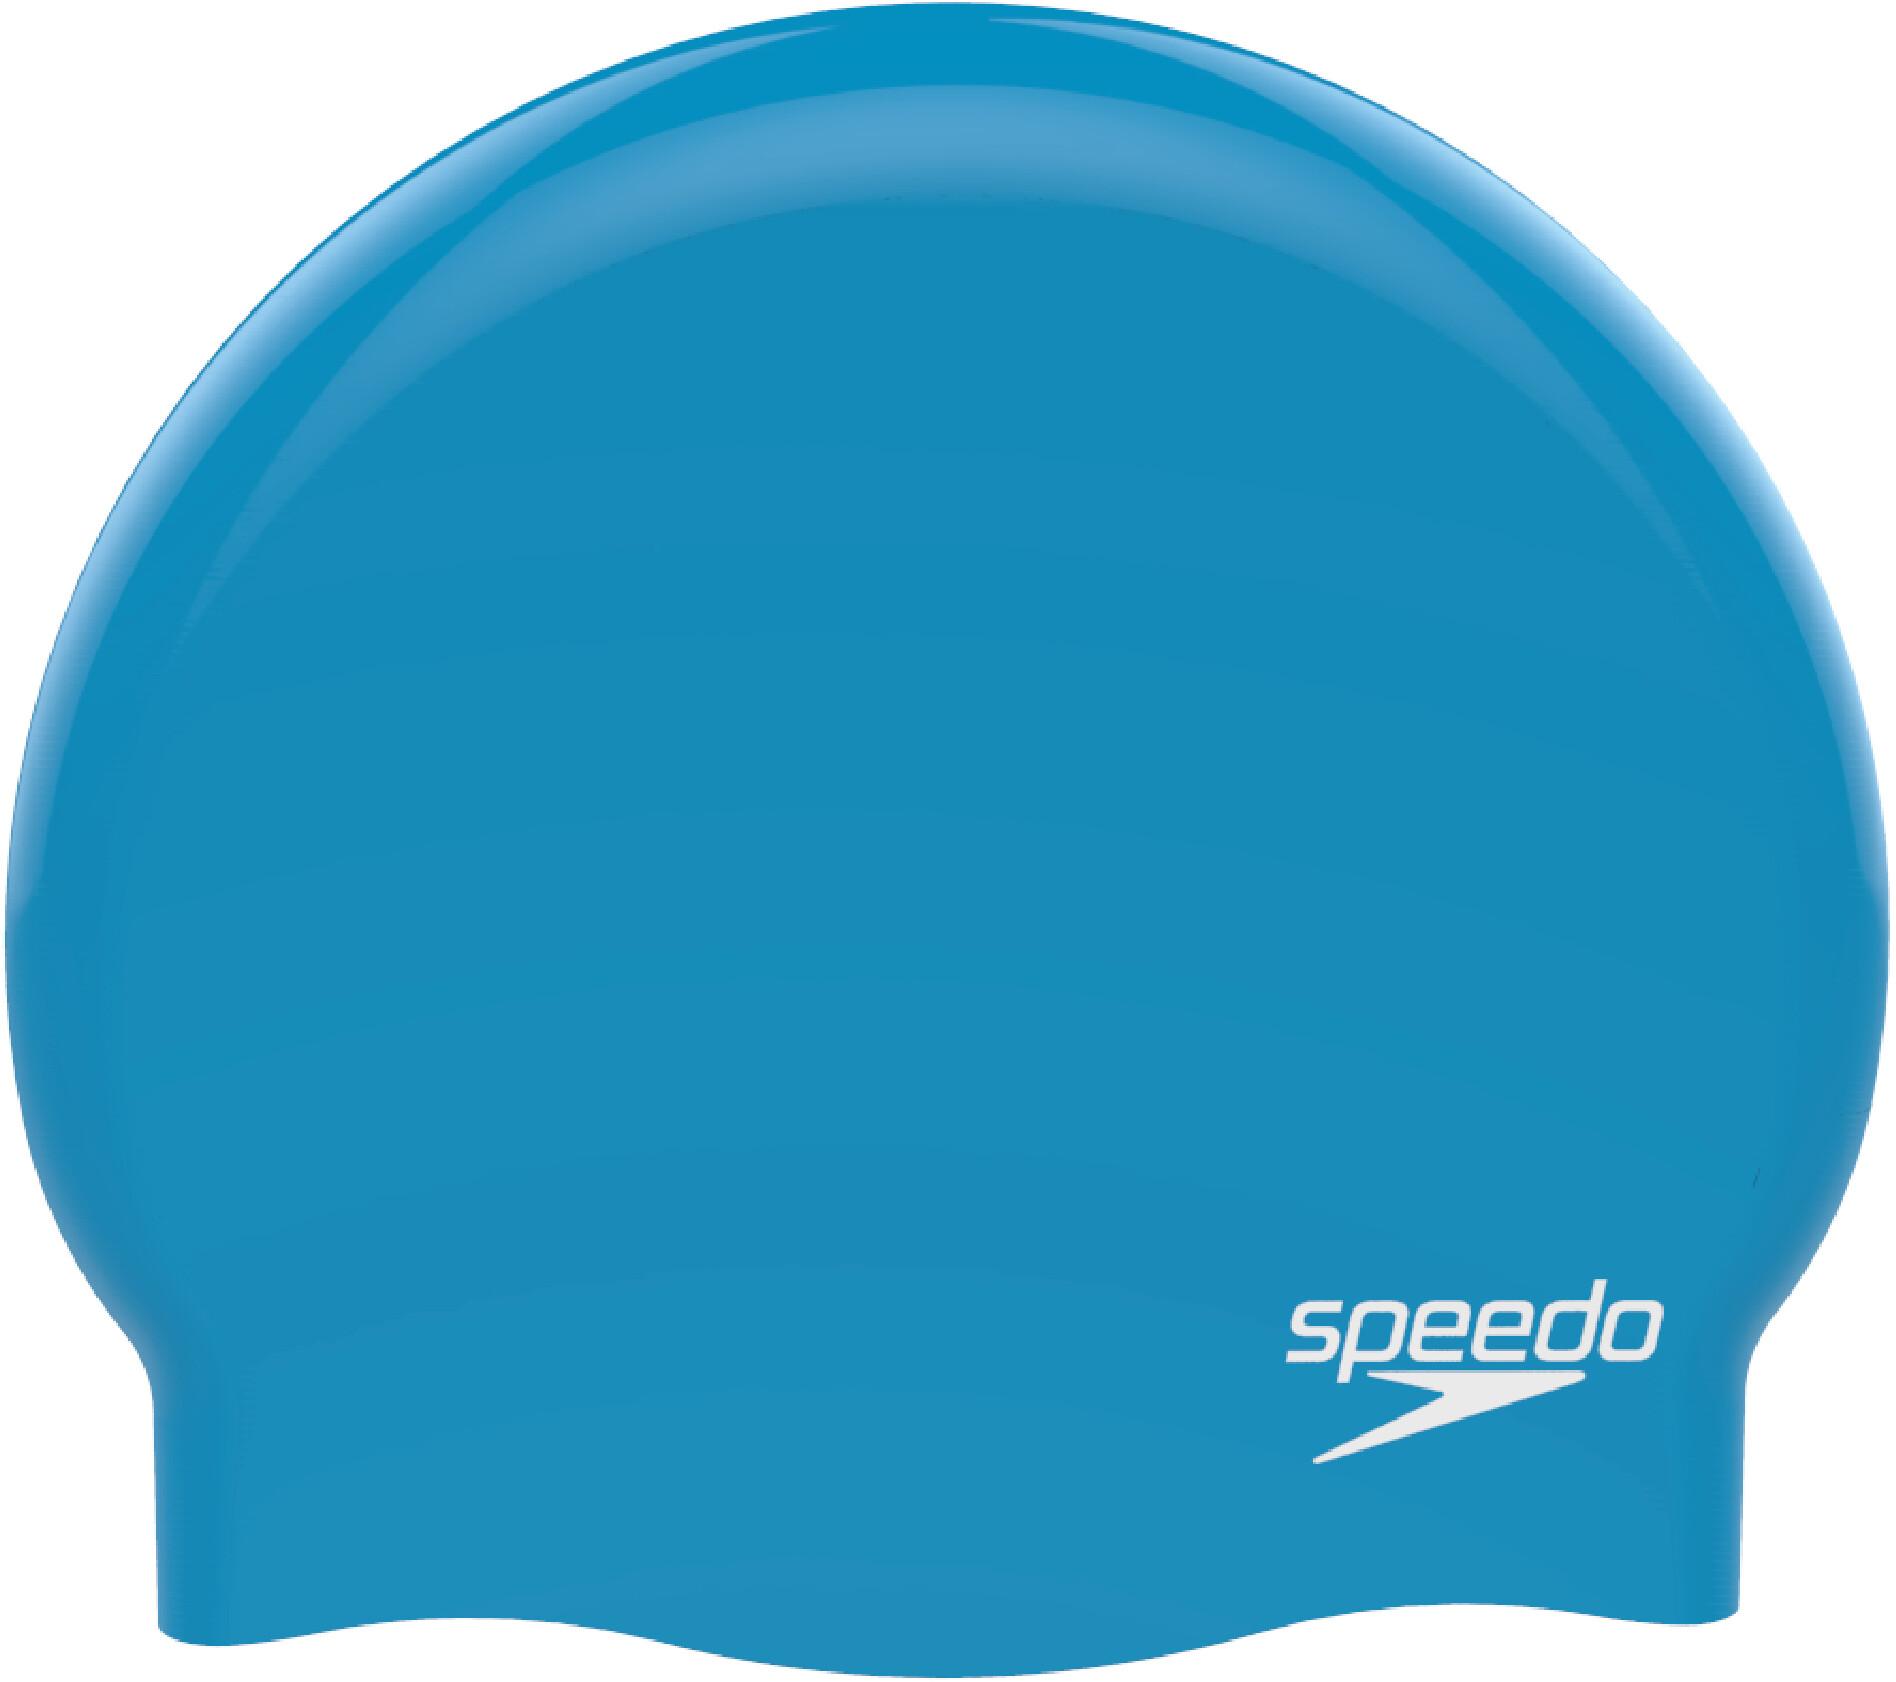 d38cf7d581115c speedo Plain Moulded Czepek pływacki, blue/chrome   Sklep Bikester.pl